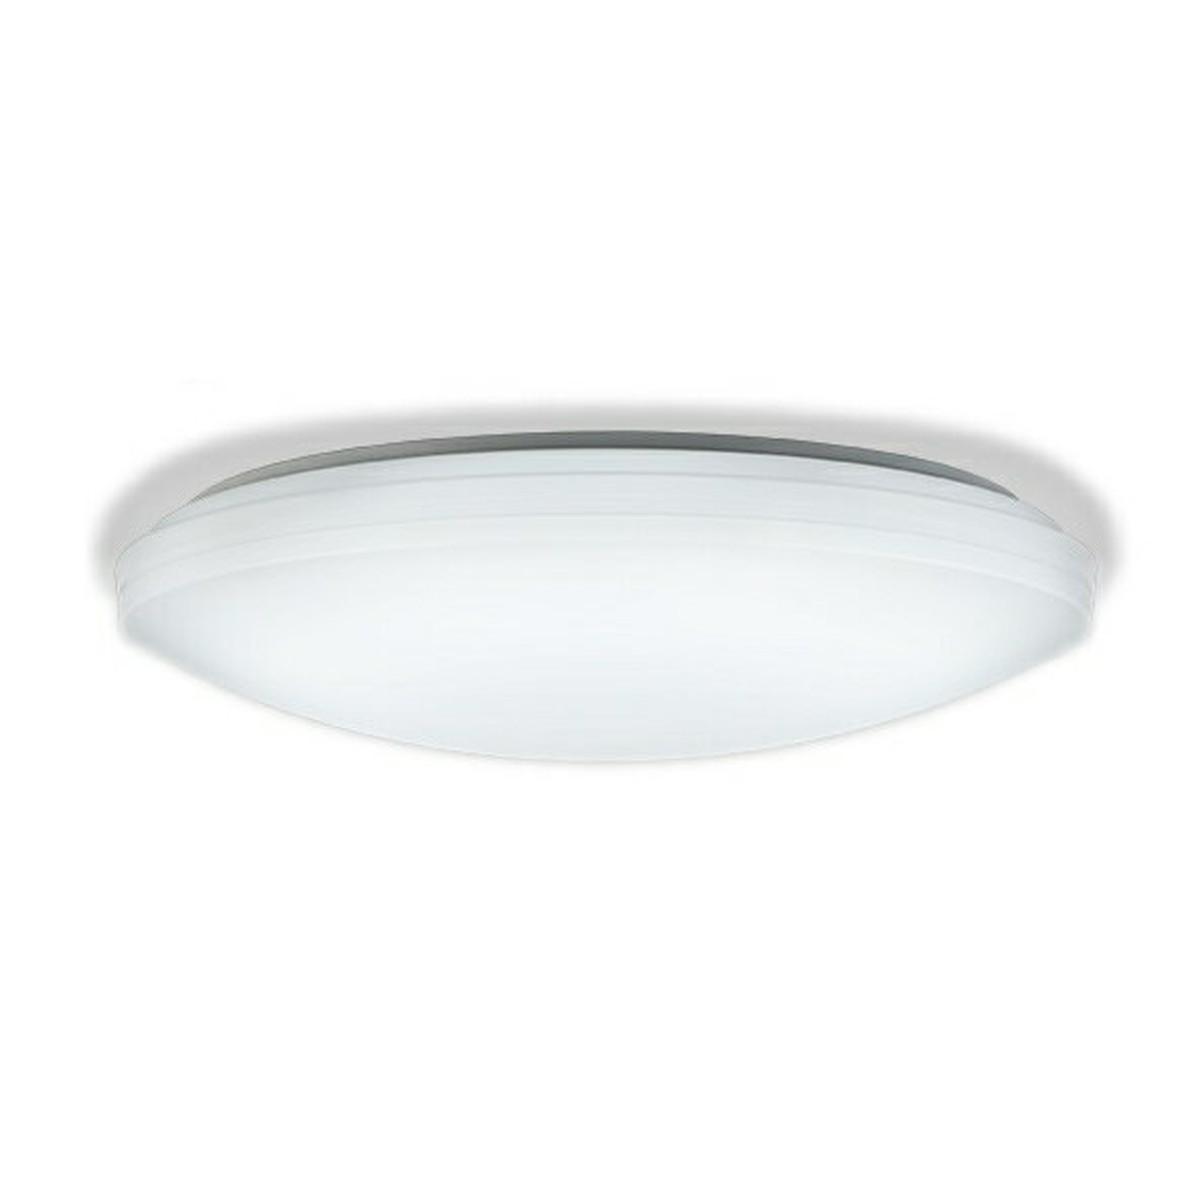 NEC LEDシーリングライト HLDZ12208【クーポン配布中】